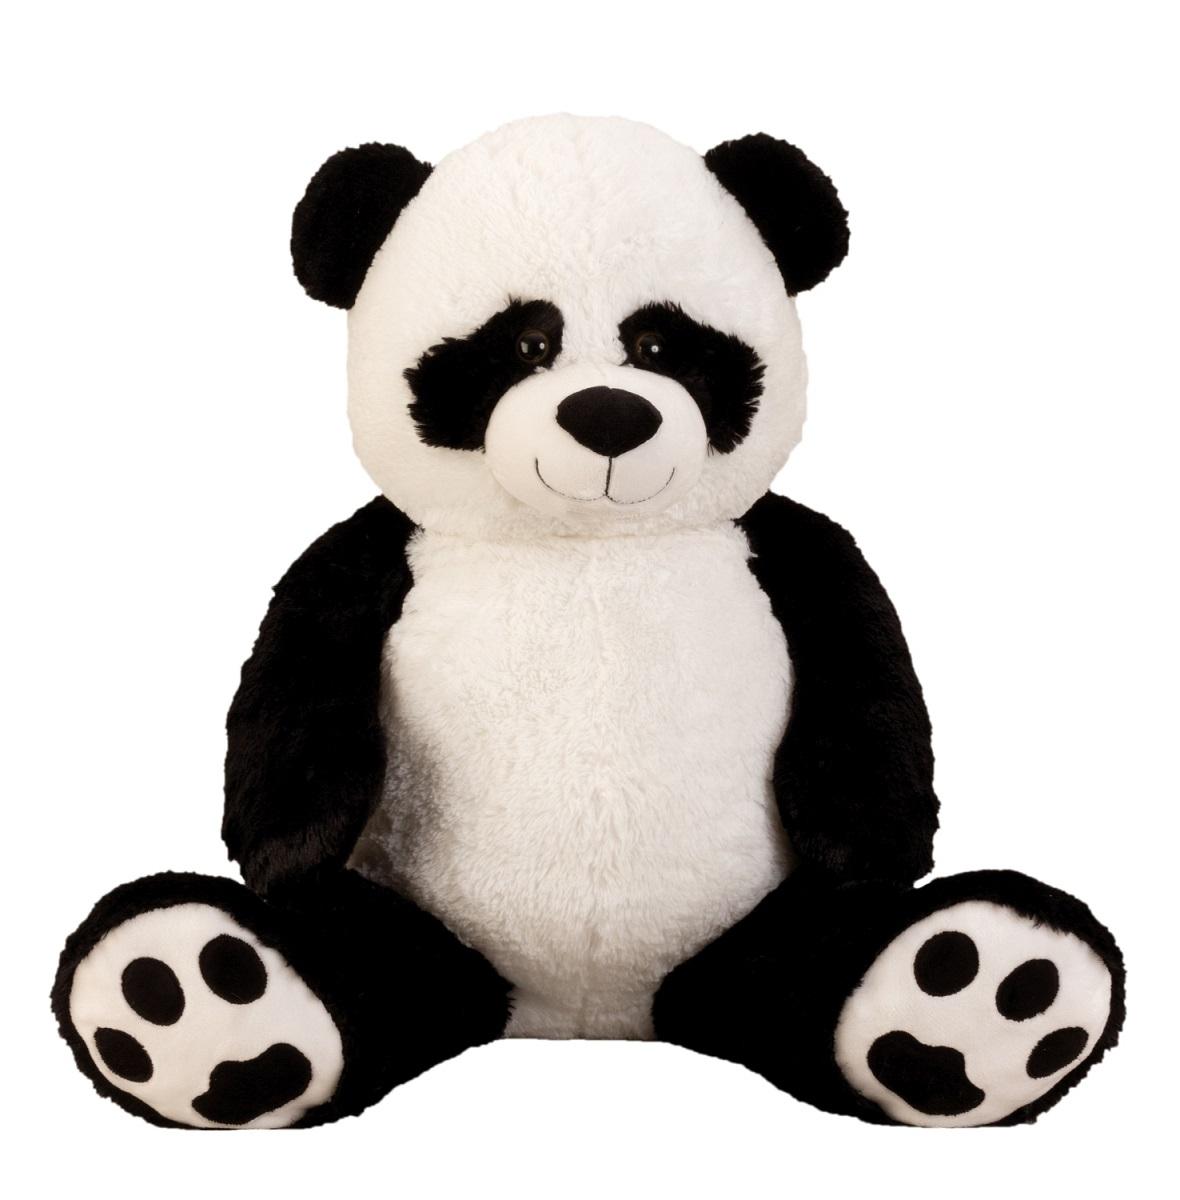 xxl panda b r teddyb r 1m riesen gro kuscheltier 100 cm teddy pandab r ebay. Black Bedroom Furniture Sets. Home Design Ideas